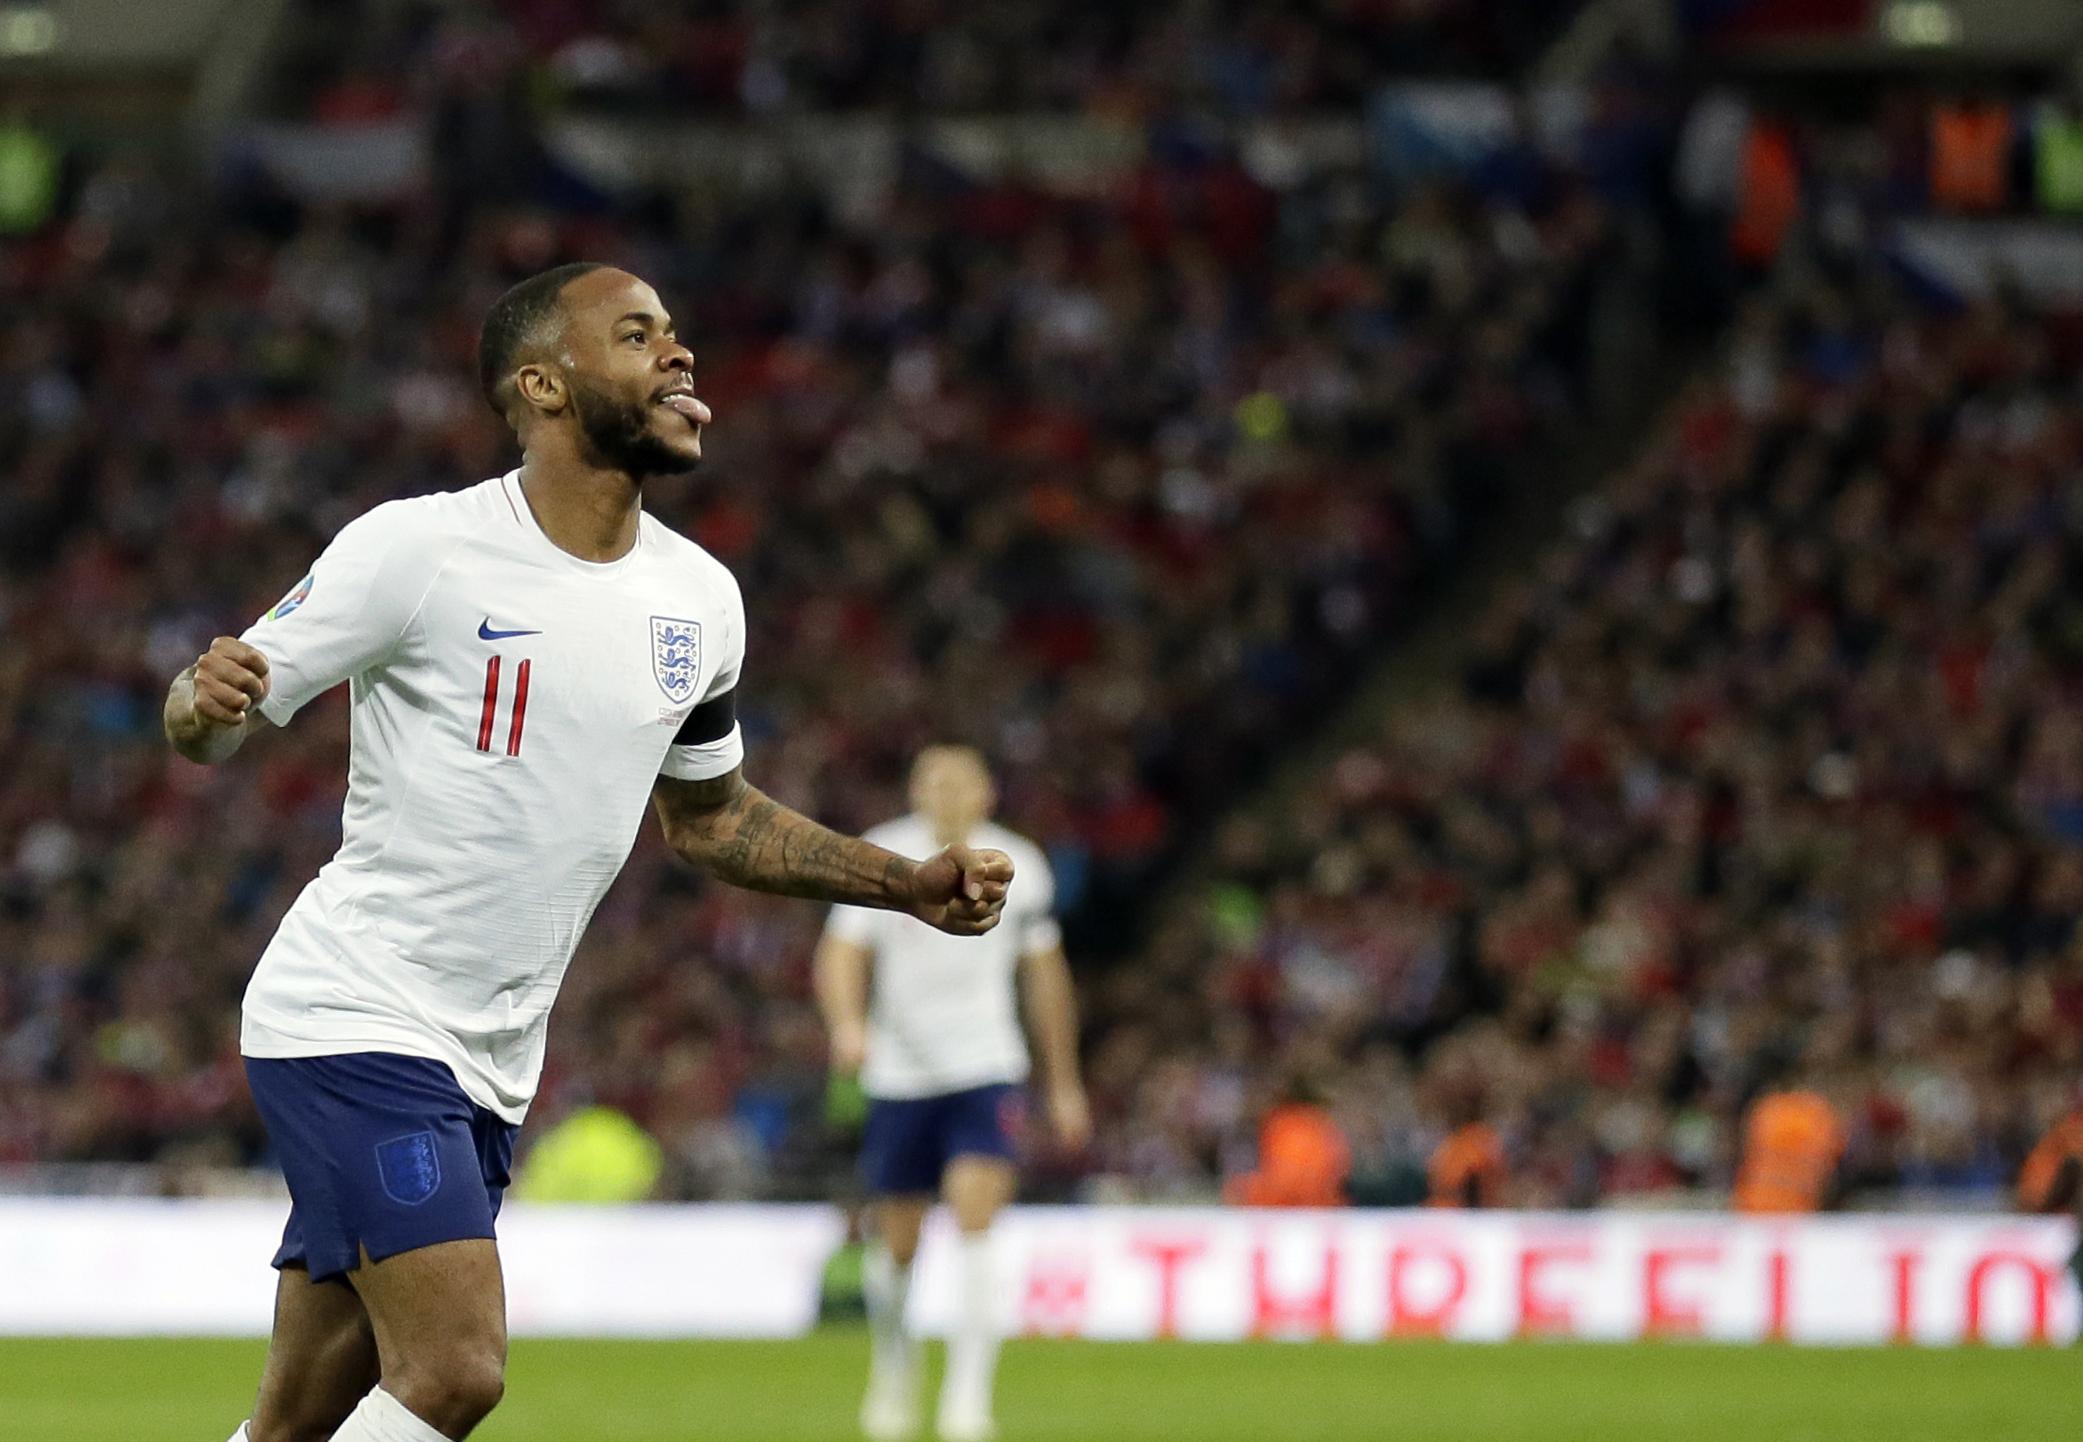 Sterling scores hat trick, England beats Czech Republic 5-0